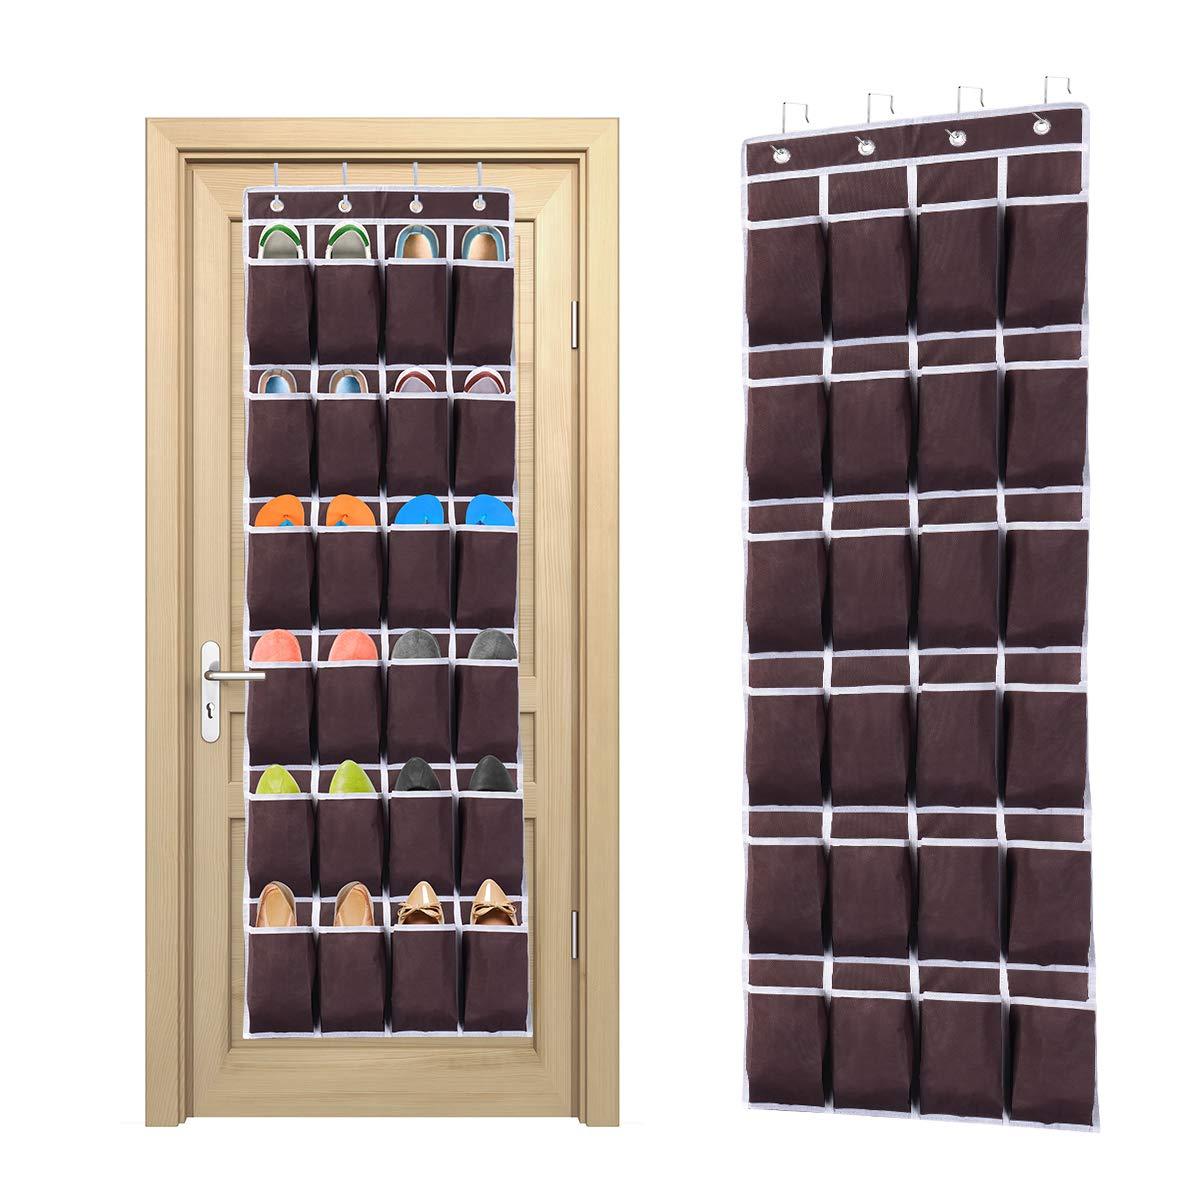 Ecbrt Over the Door Shoe Organiser 24 Pockets Hanging Shoe Holder with 4 Metal Hooks